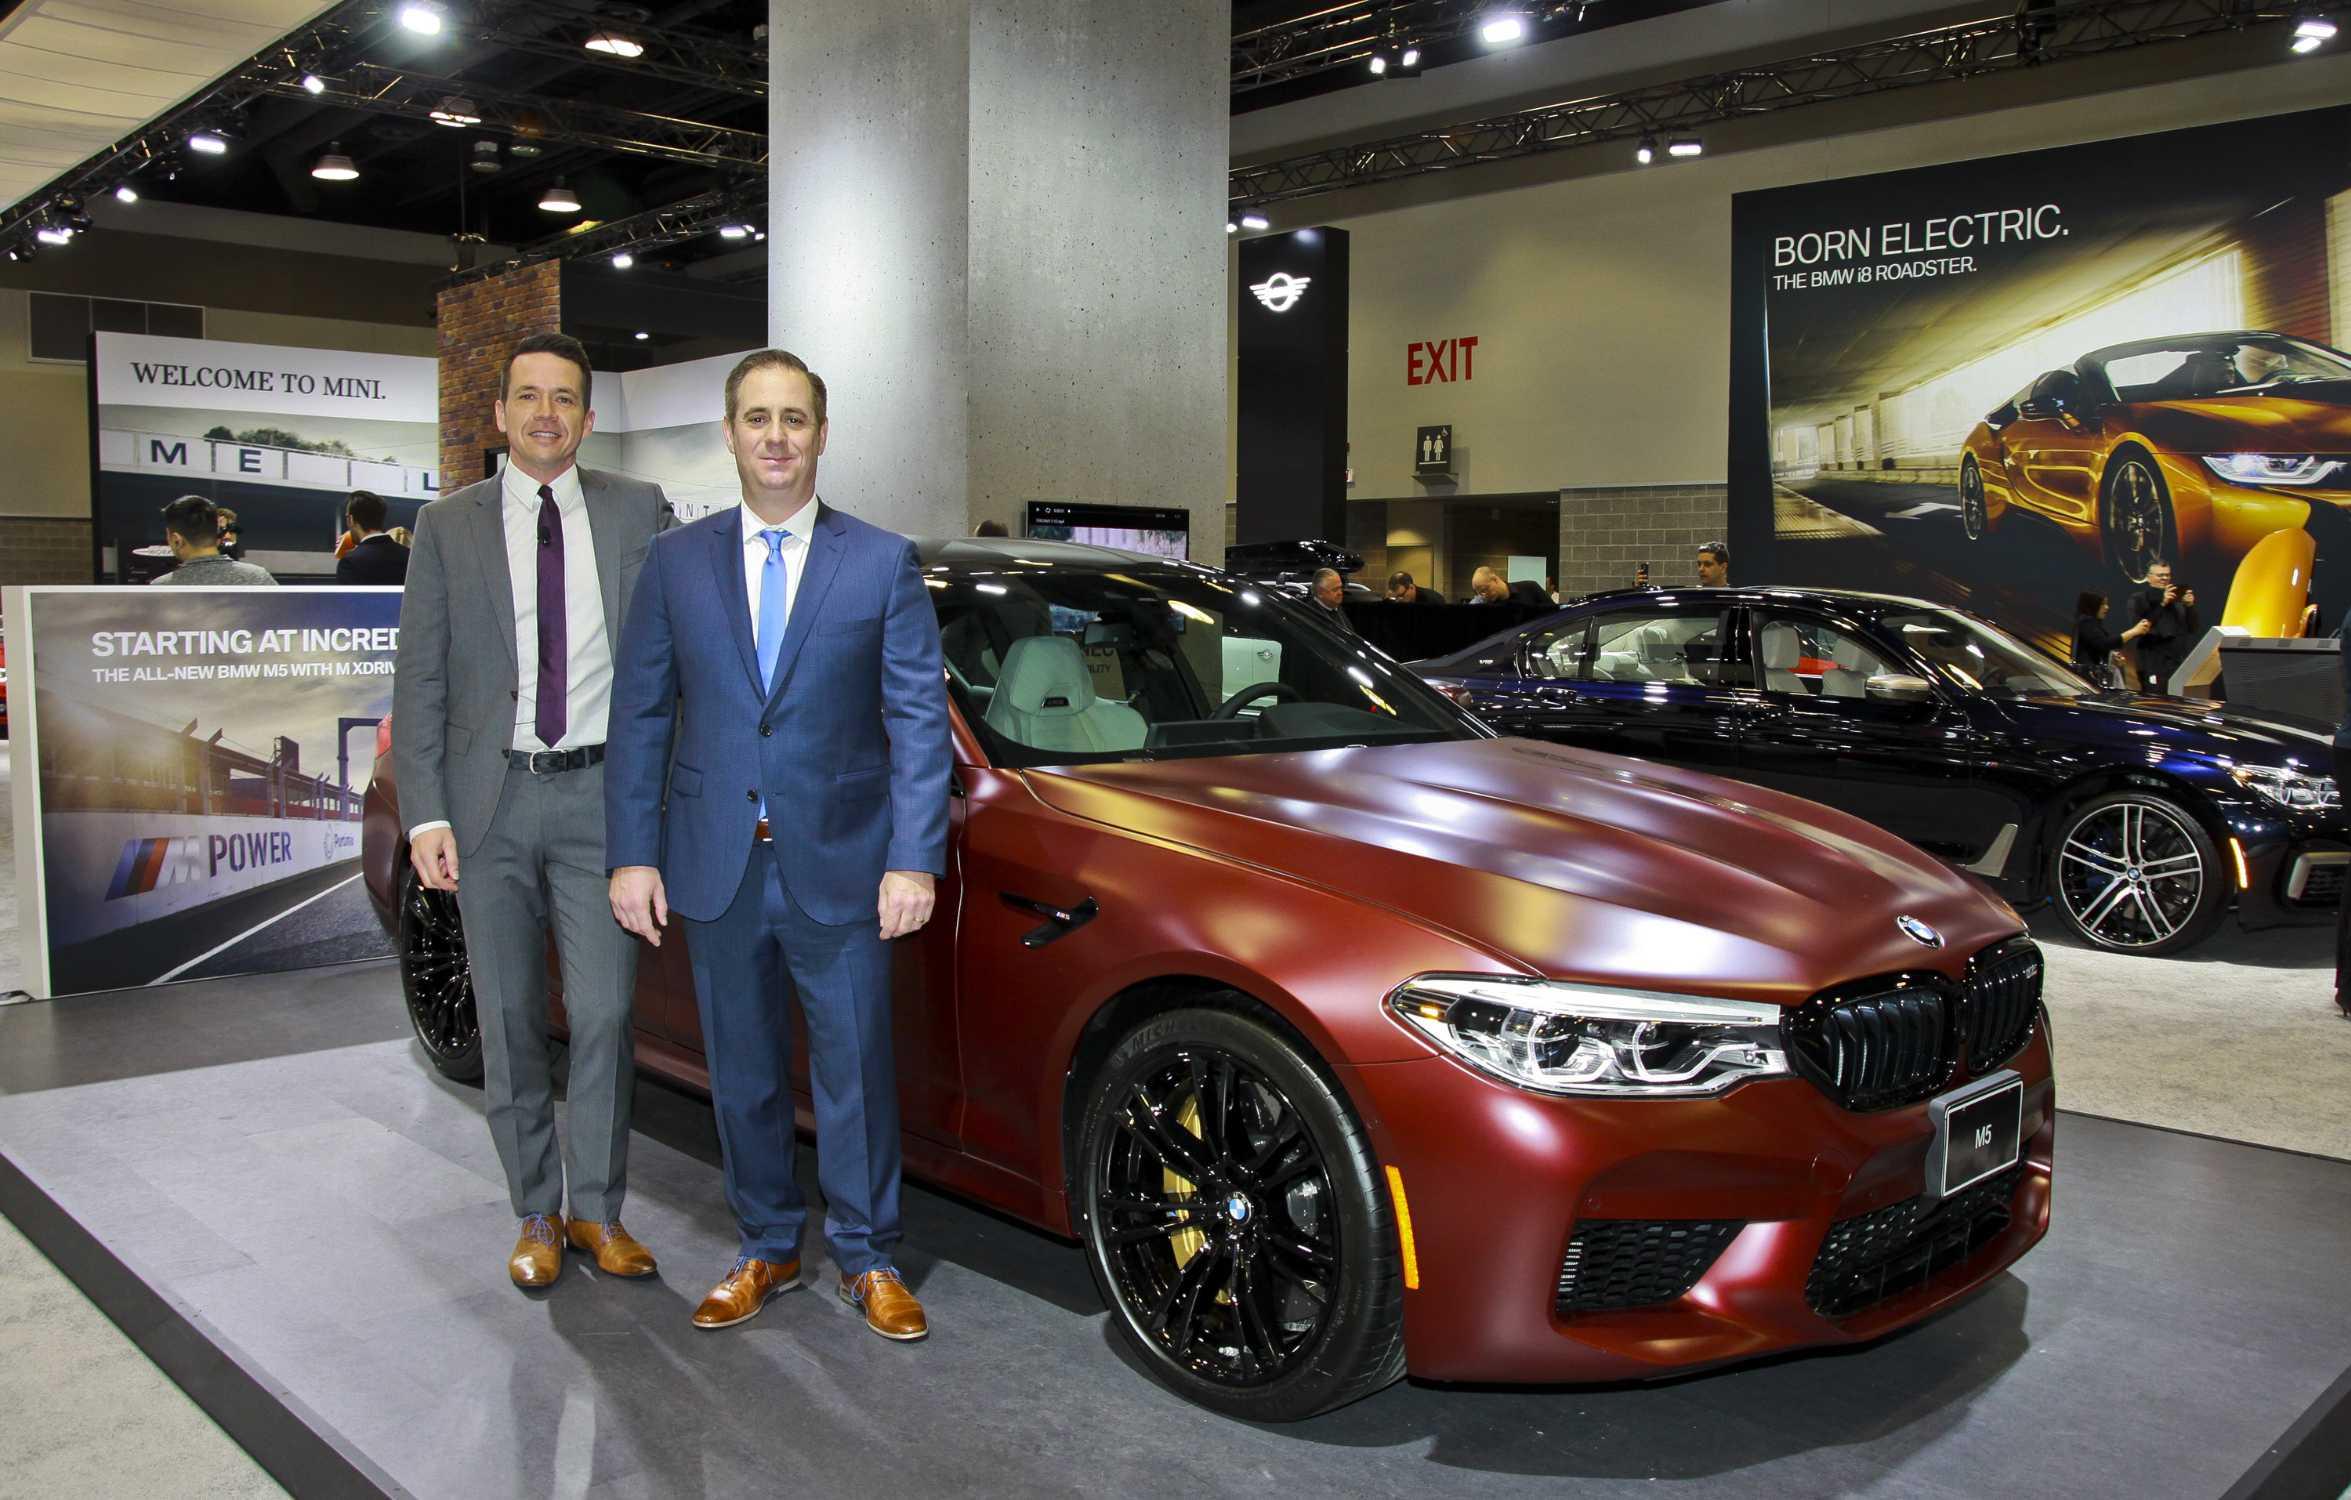 Vancouver auto sales / Kohls 30 percent off code